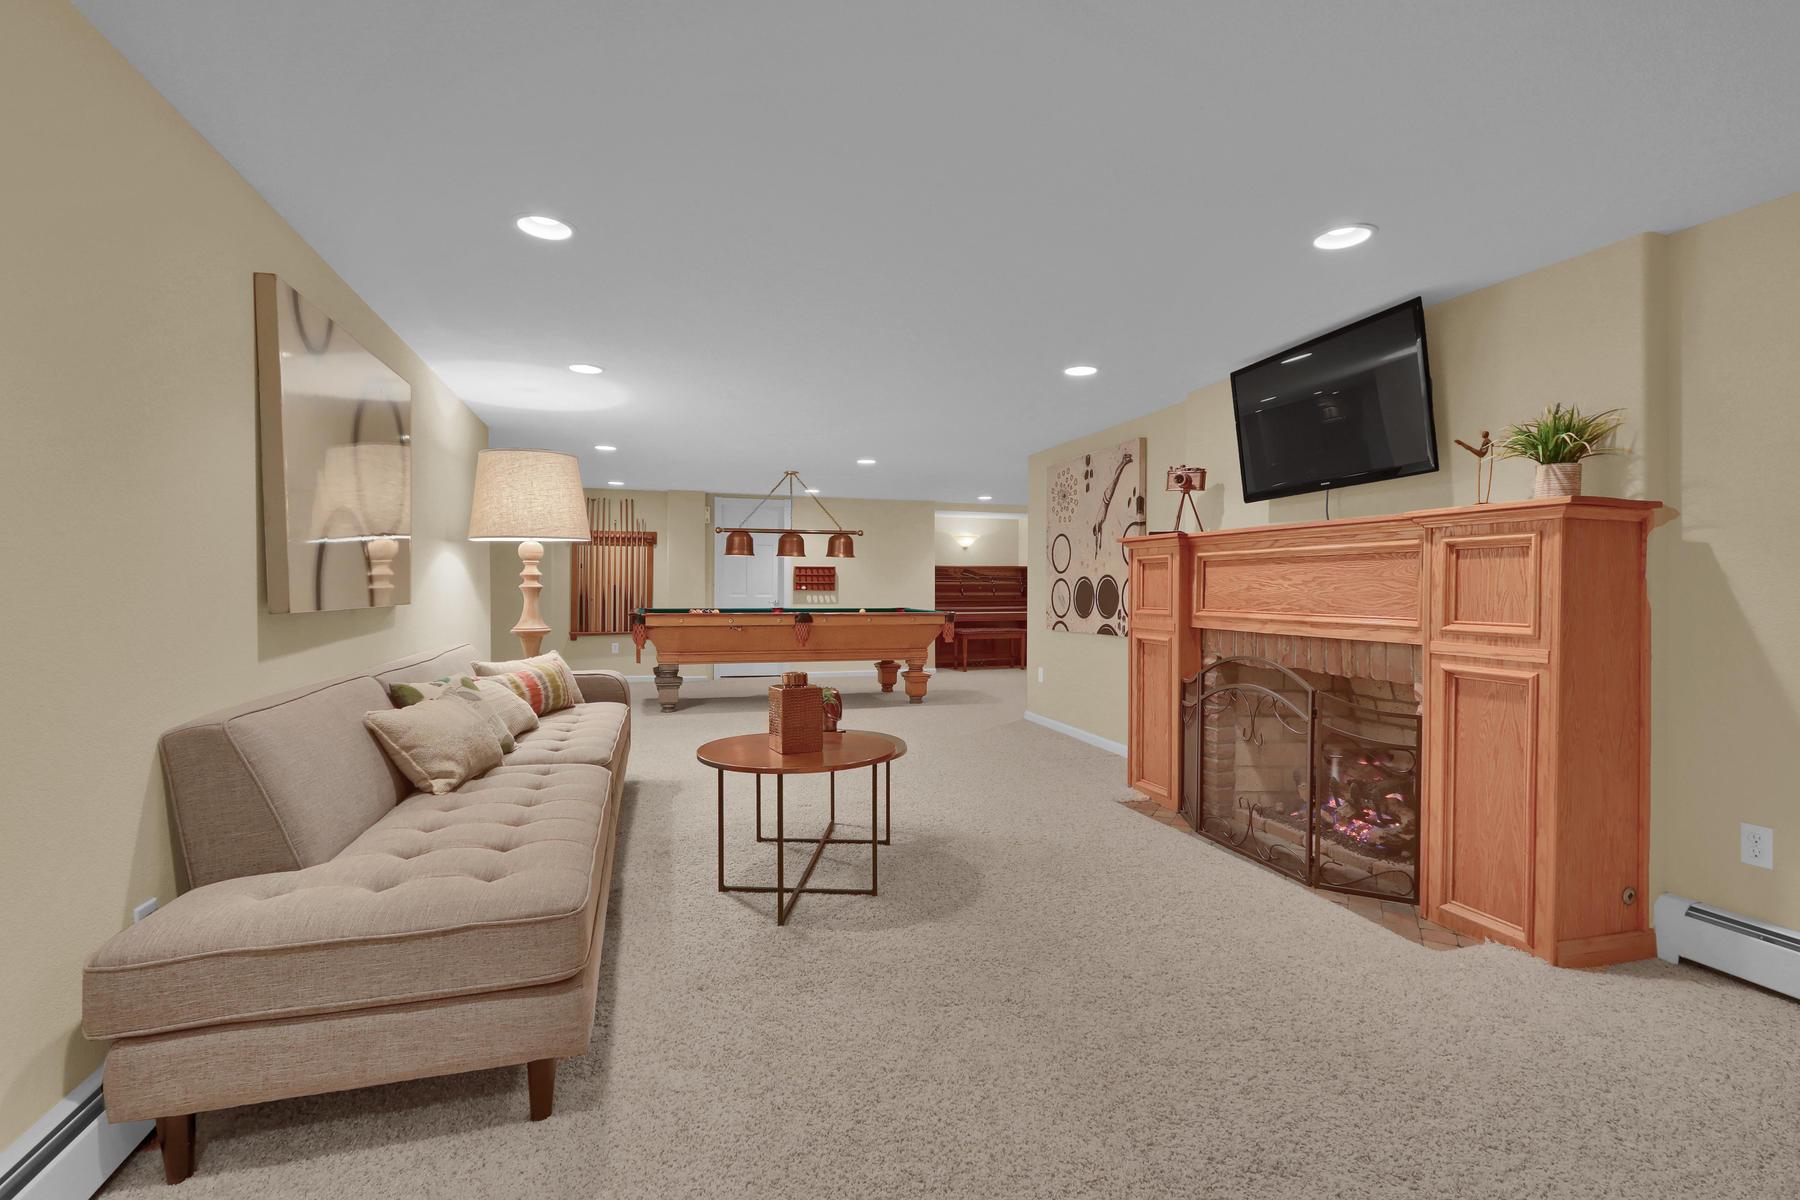 3845 Everett St Wheat Ridge CO-036-8-Basement-MLS_Size.jpg